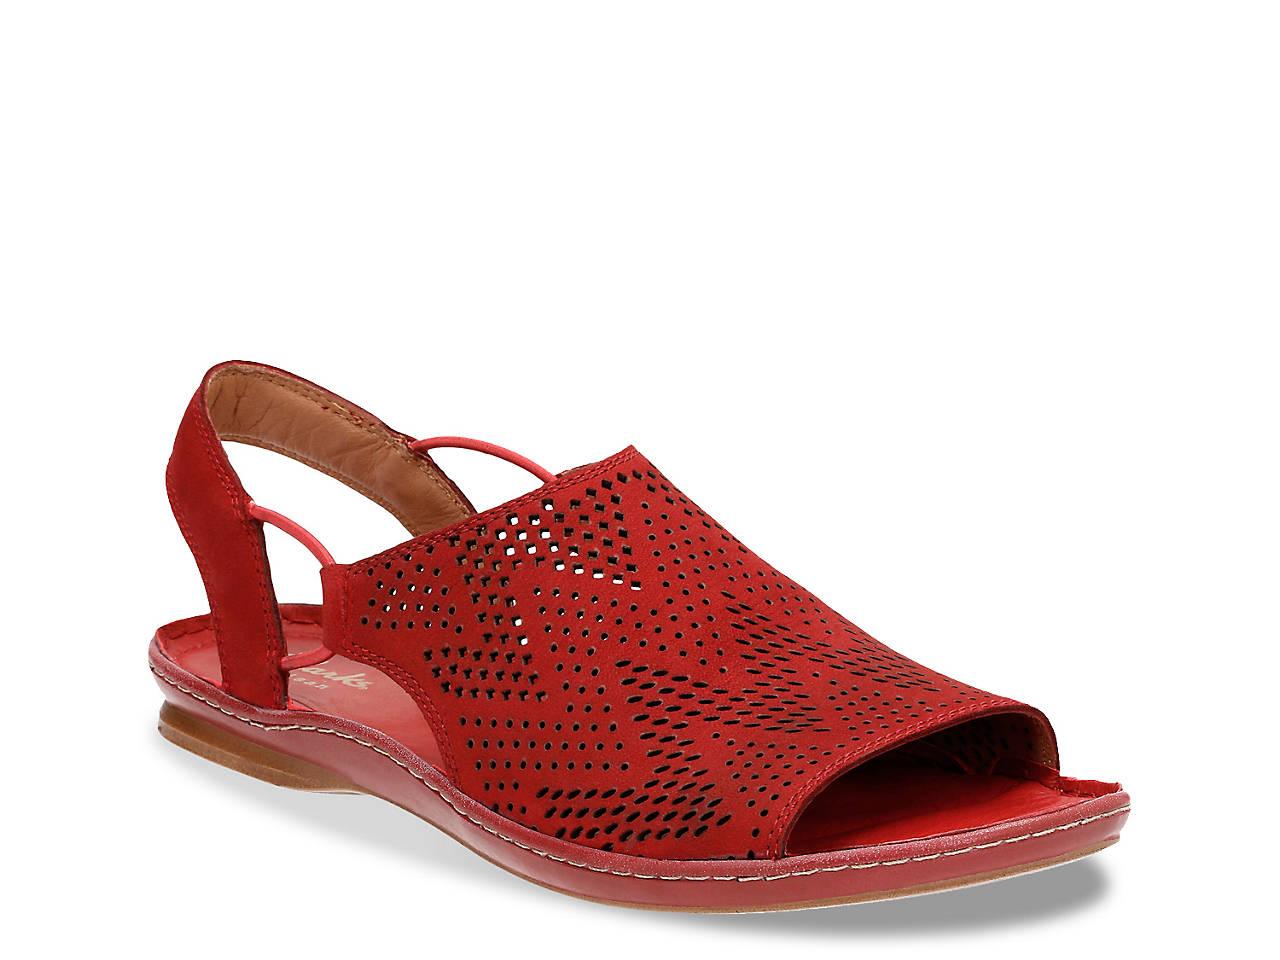 Clarks Sarla Cadence Sandal Women s Shoes